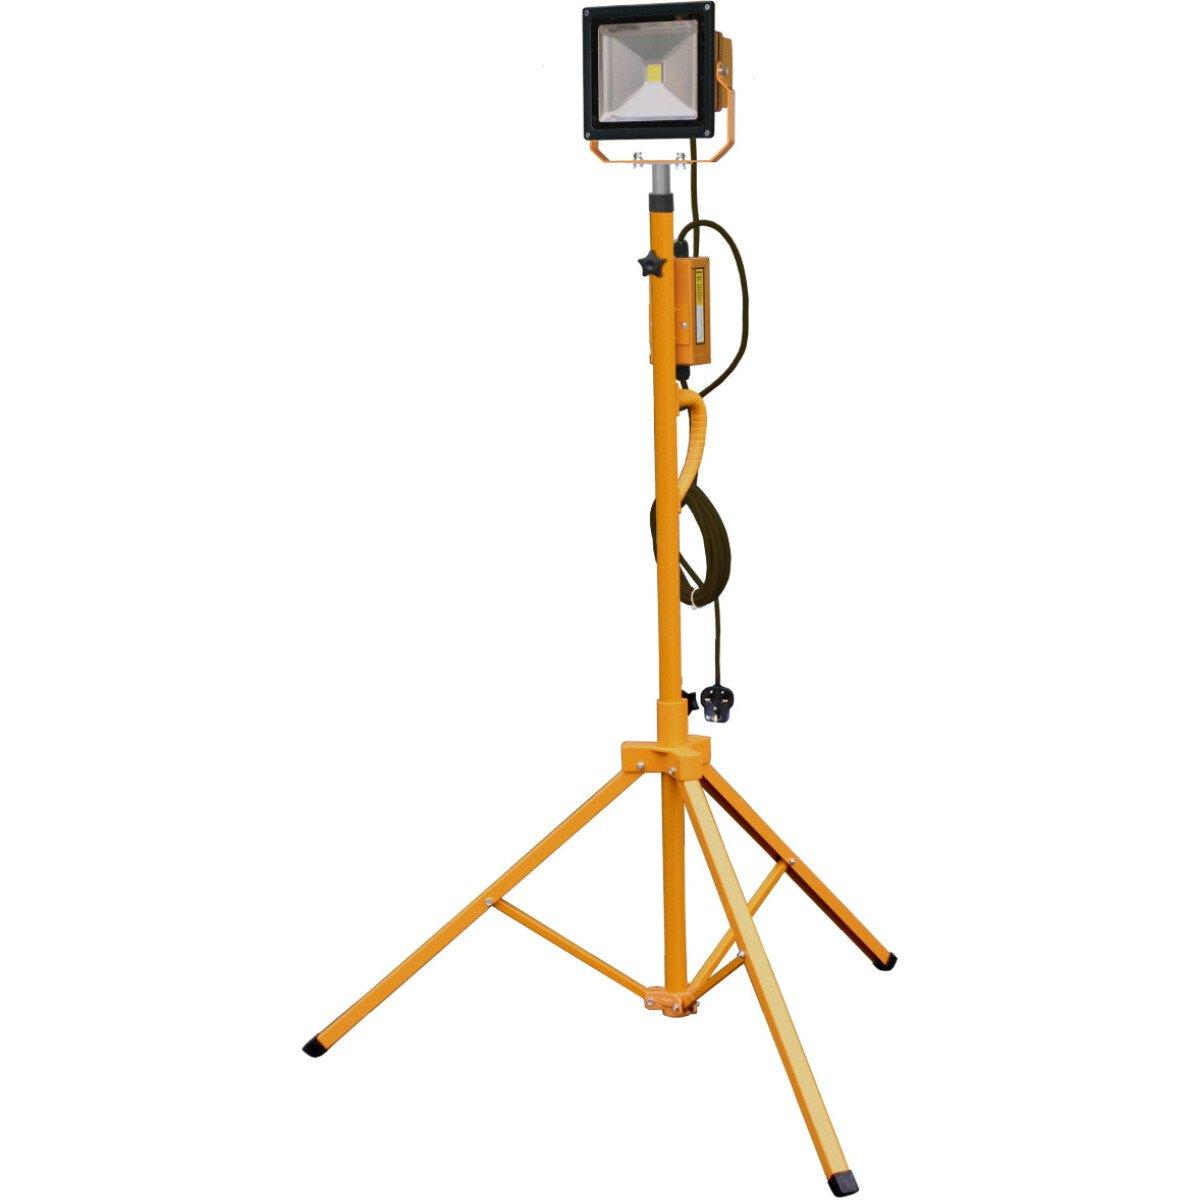 Spectre SP-17185 230V HD 30W COB LED Floodlight Work Light